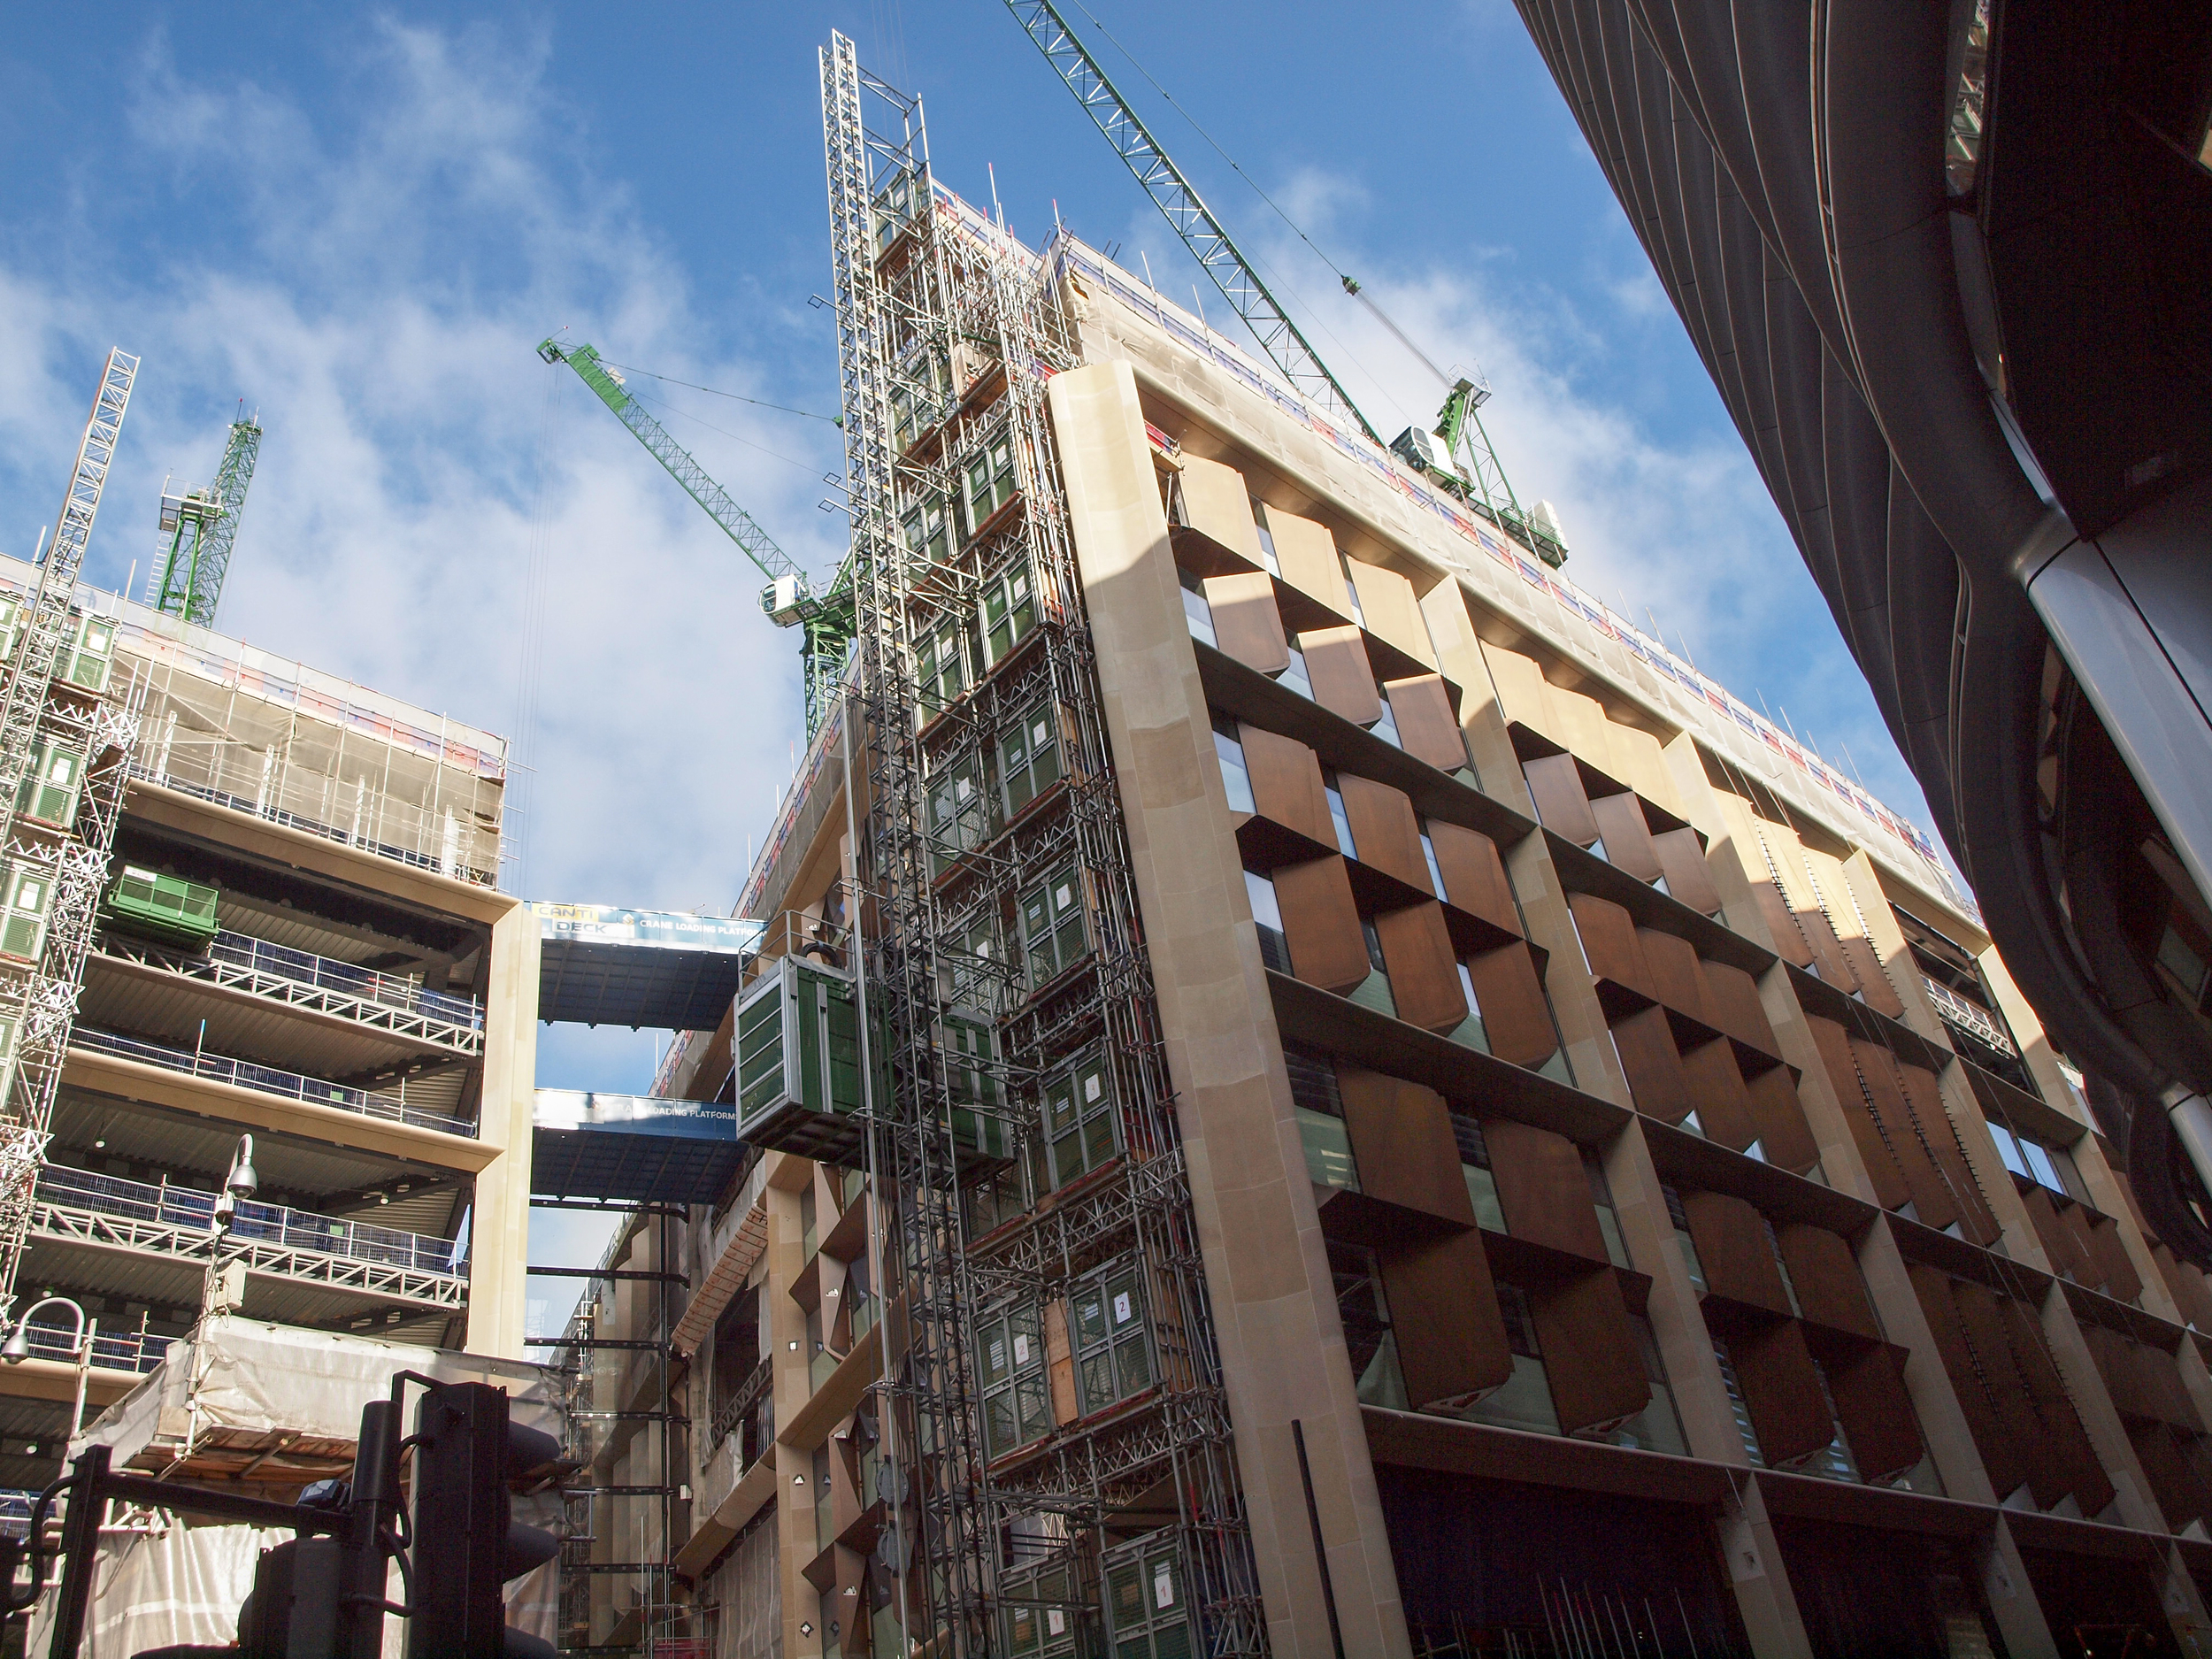 Walbrook Square ( Darth Vadar Helmet) - Norman Foster + Jean Nouvel [Under Construction]